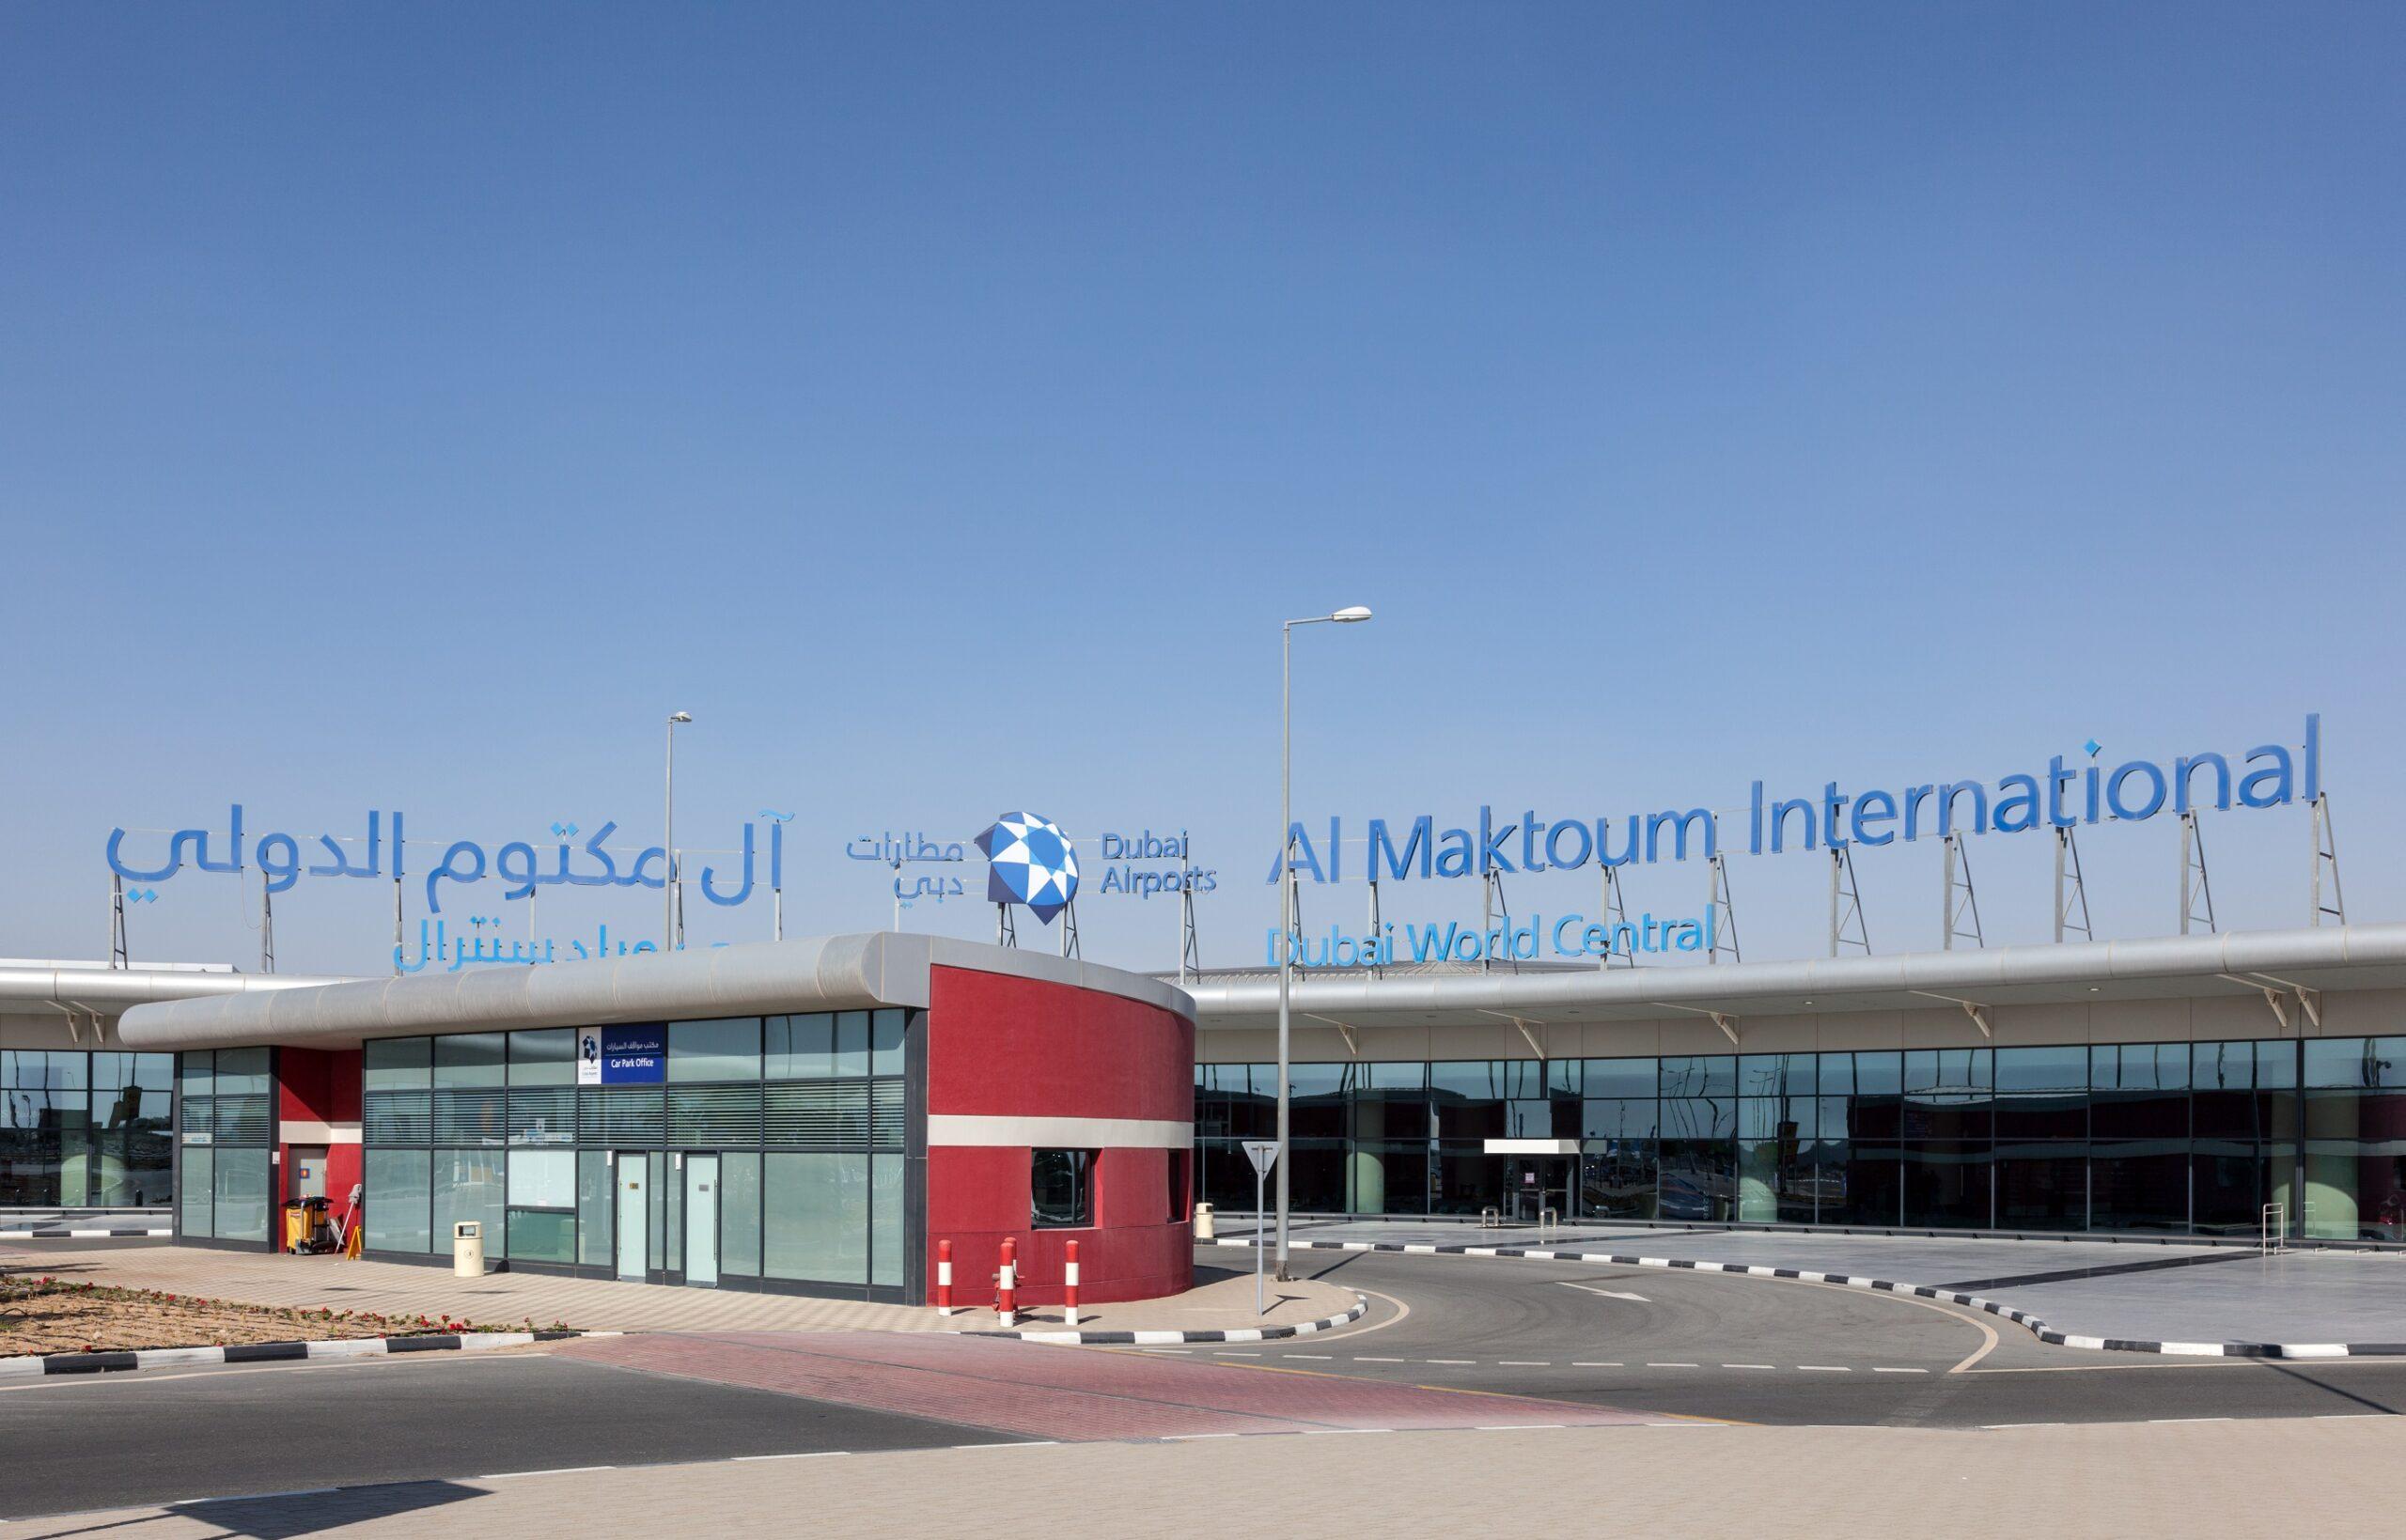 Where is Al Maktoum International Airport